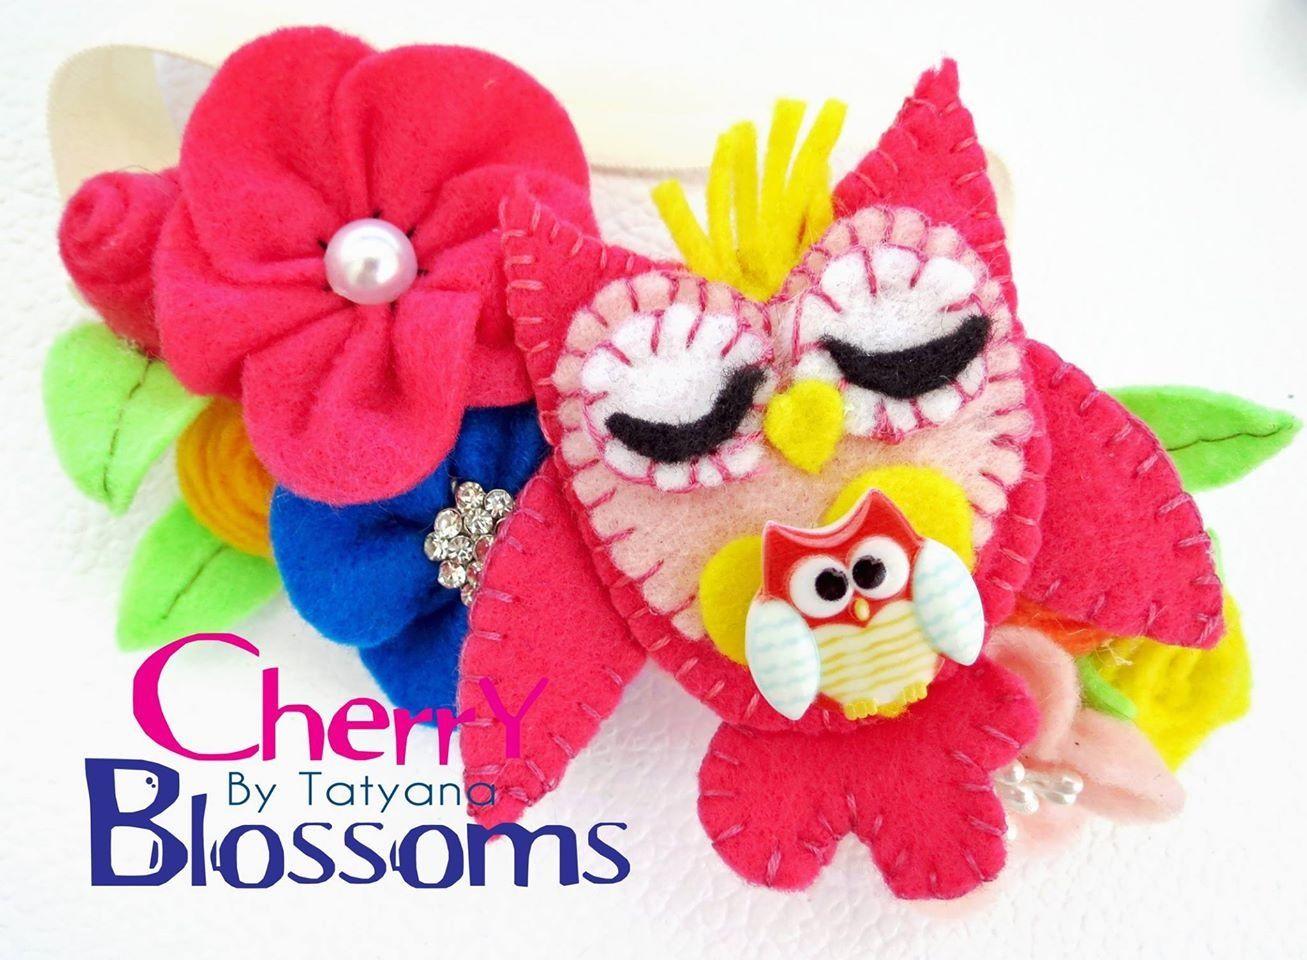 Owl headband made by Cherry blossoms by Tatyana